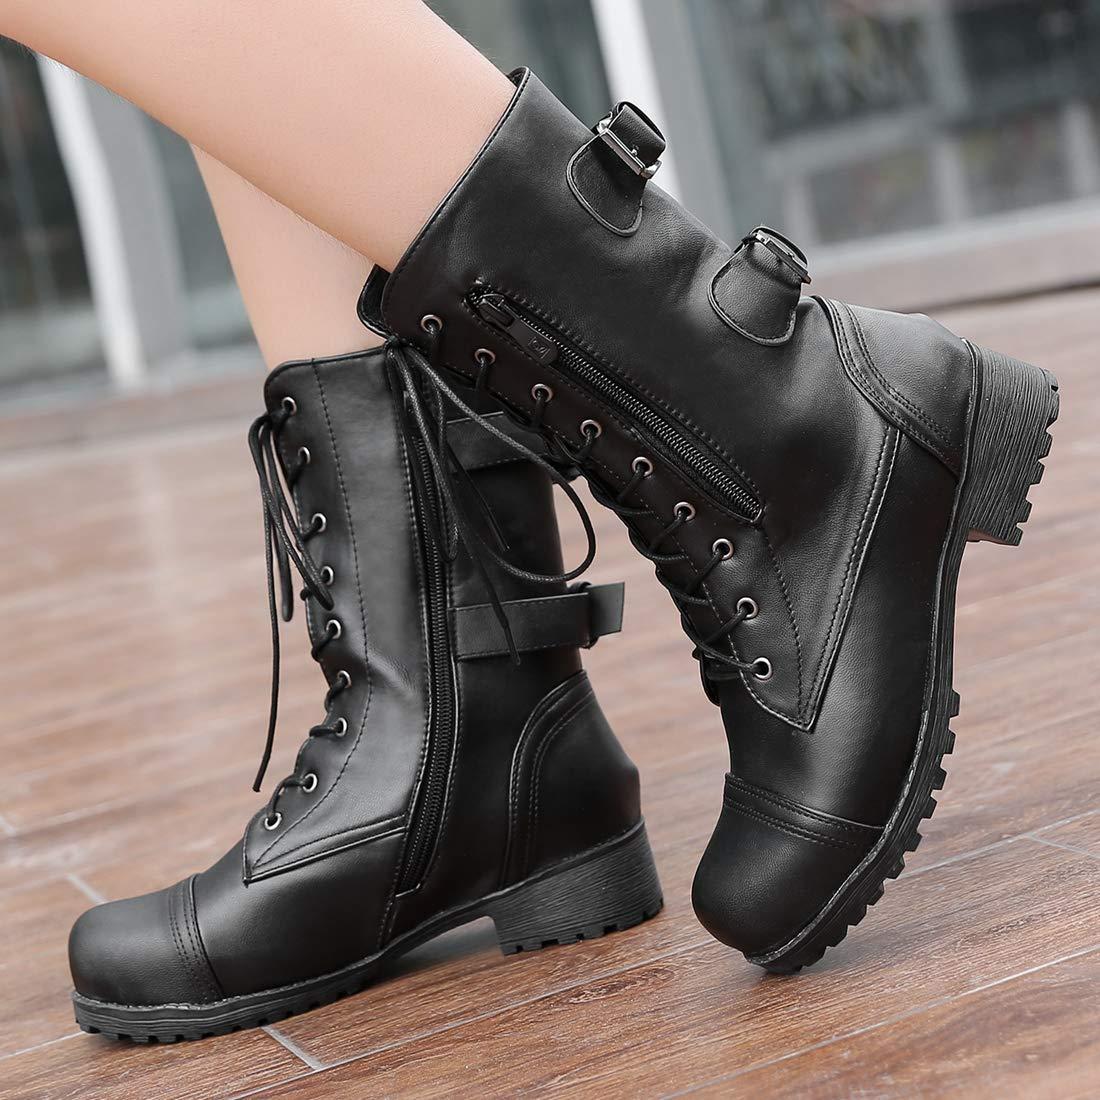 Vitalo Womens Lace Up Mid Calf Military Buckle Combat Biker Boots